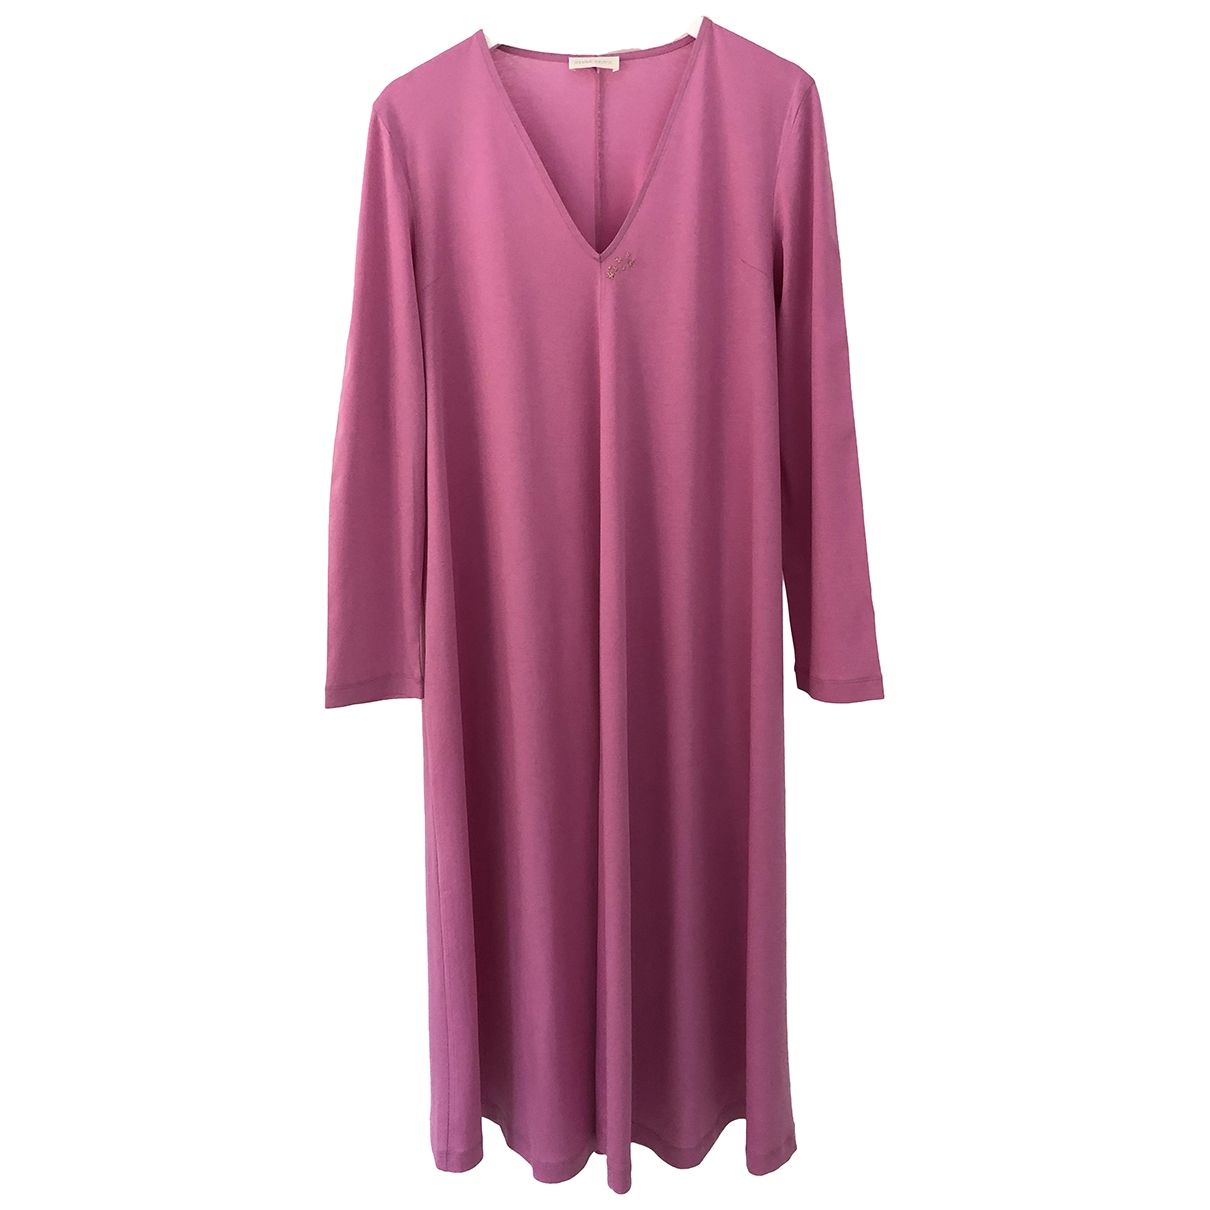 Stine Goya \N Kleid in  Rosa Baumwolle